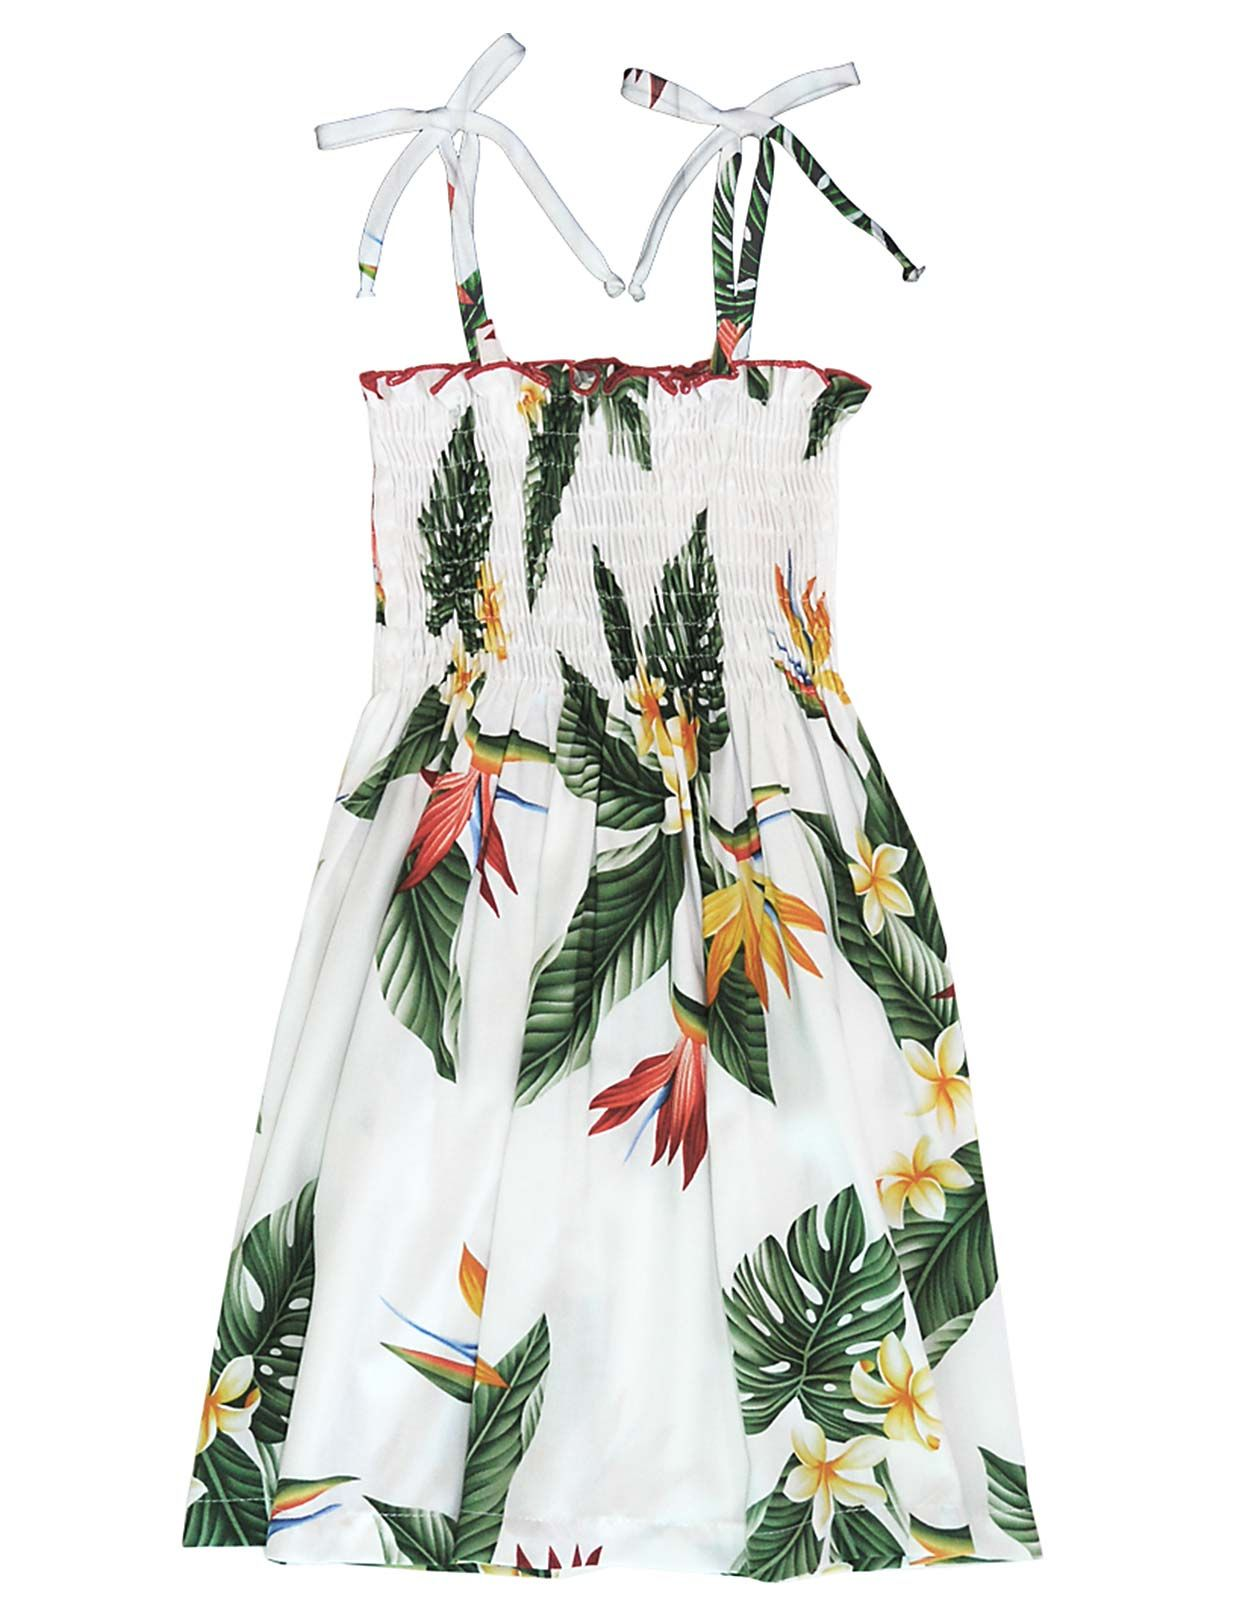 efb084fe84 Shop from Hawaii Smocked Top Girls Hawaiian Dress Birds of Paradise at Shaka  Time Hawaii Clothing Store